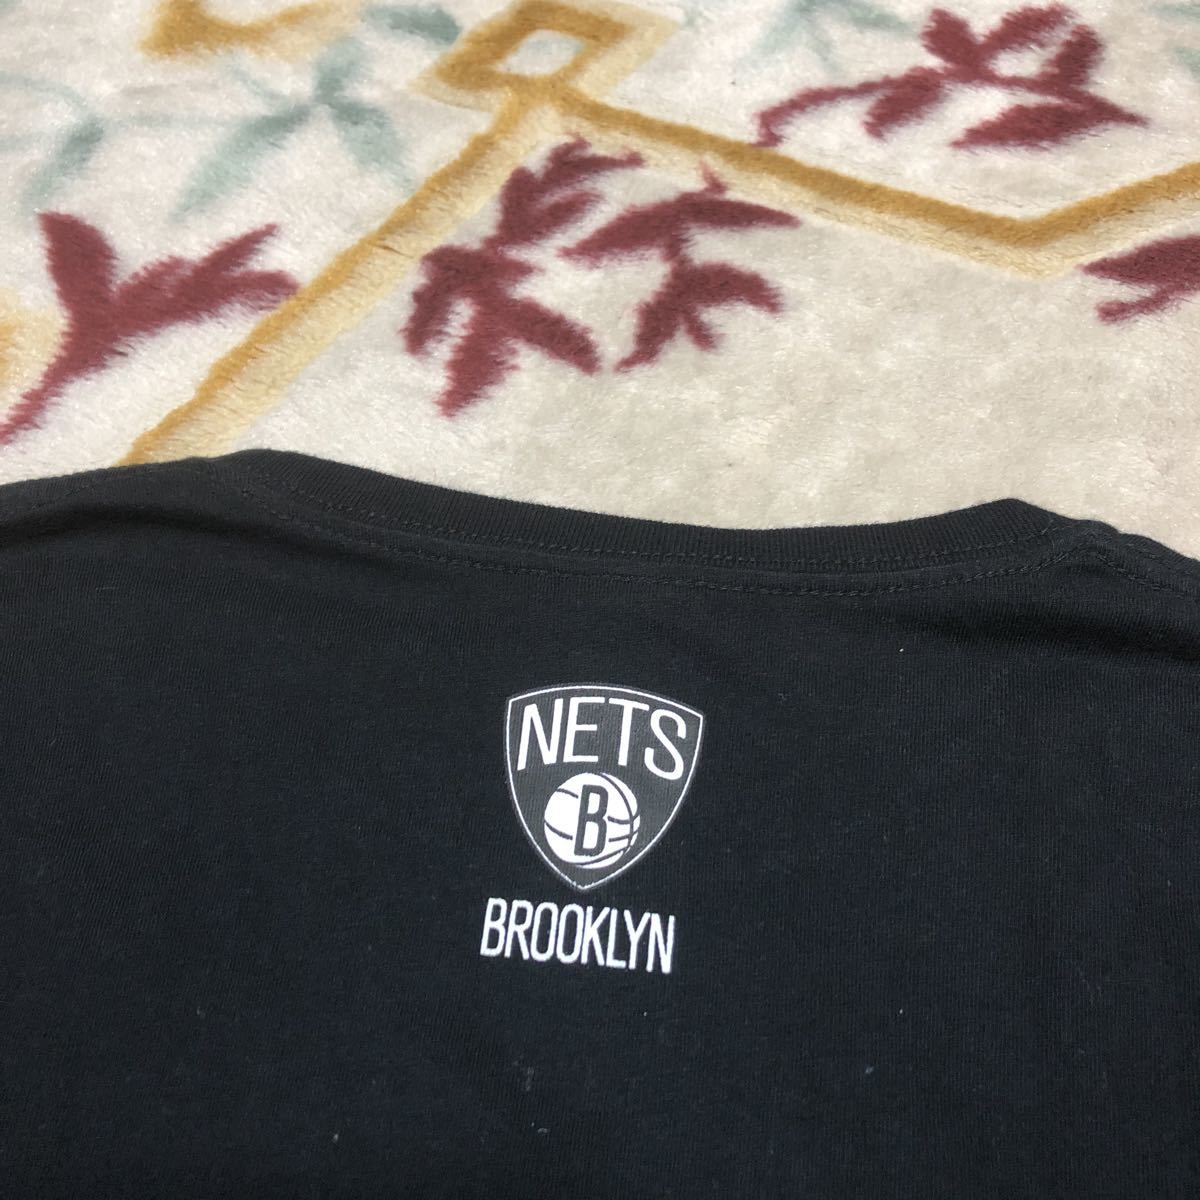 NBA Brooklyn Nets ブルックリン ネッツ Tシャツ メンズサイズM-L_画像7